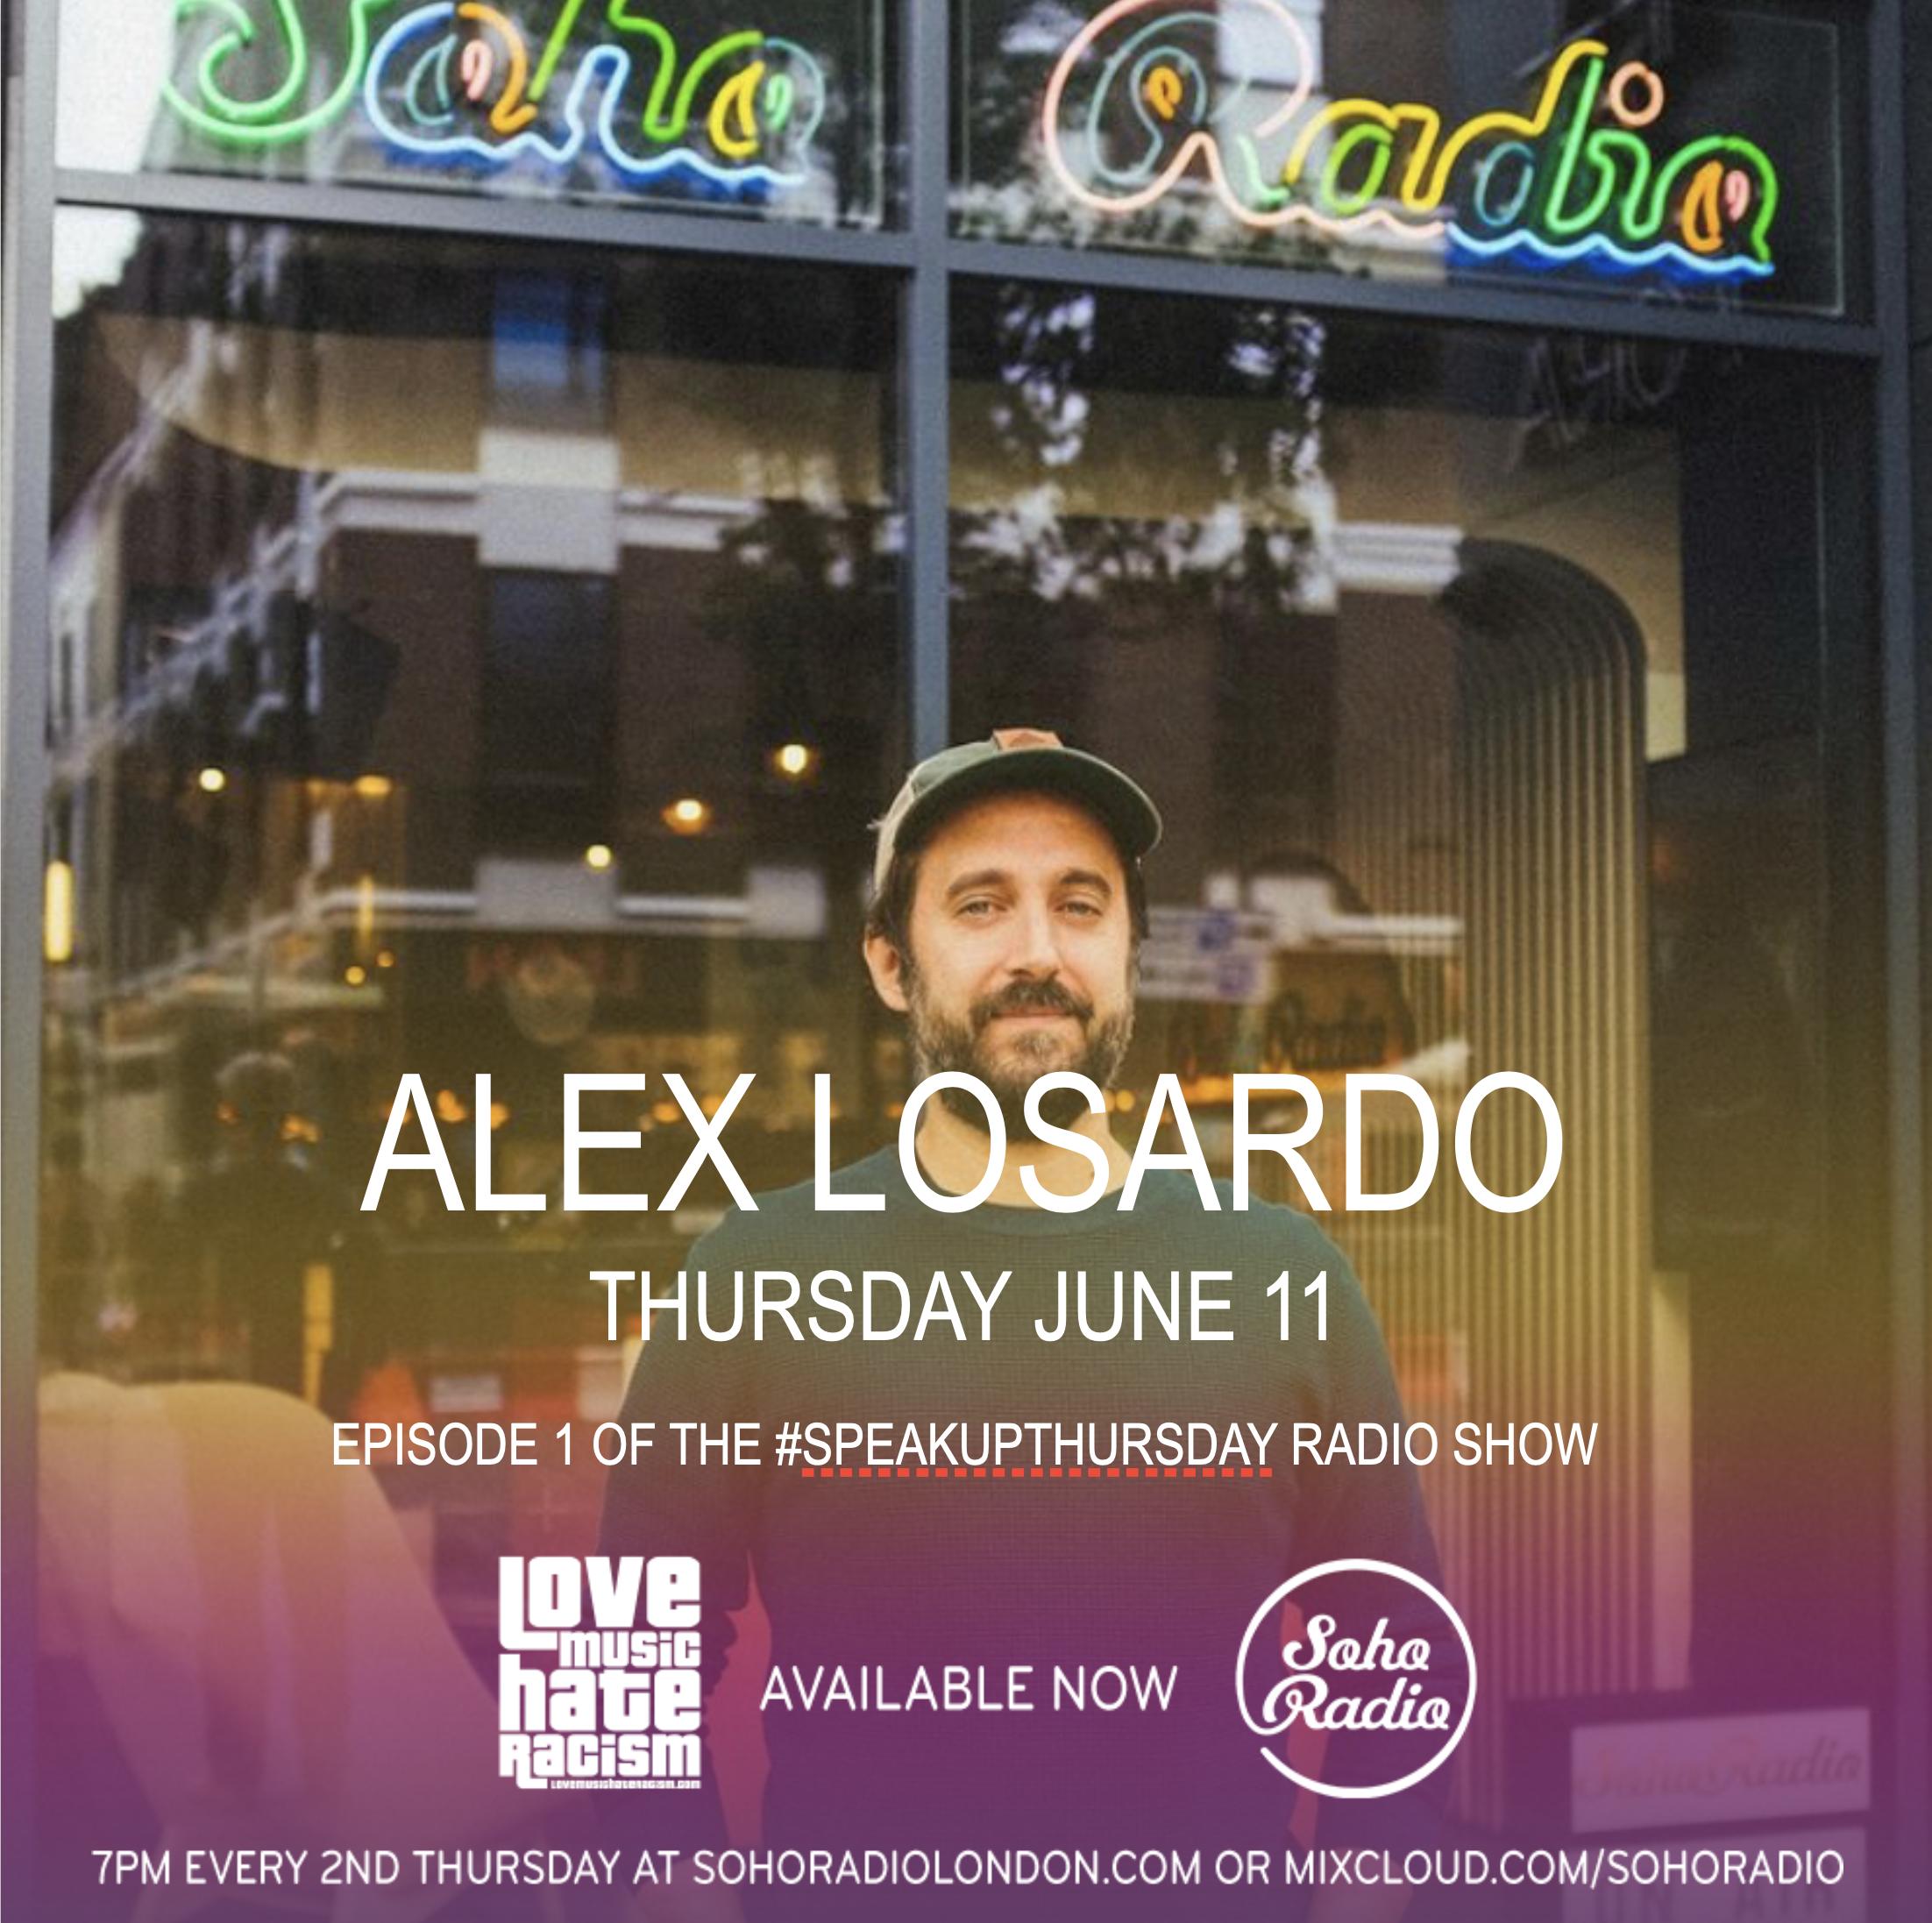 #speakupthursday featuring Alex LoSardo